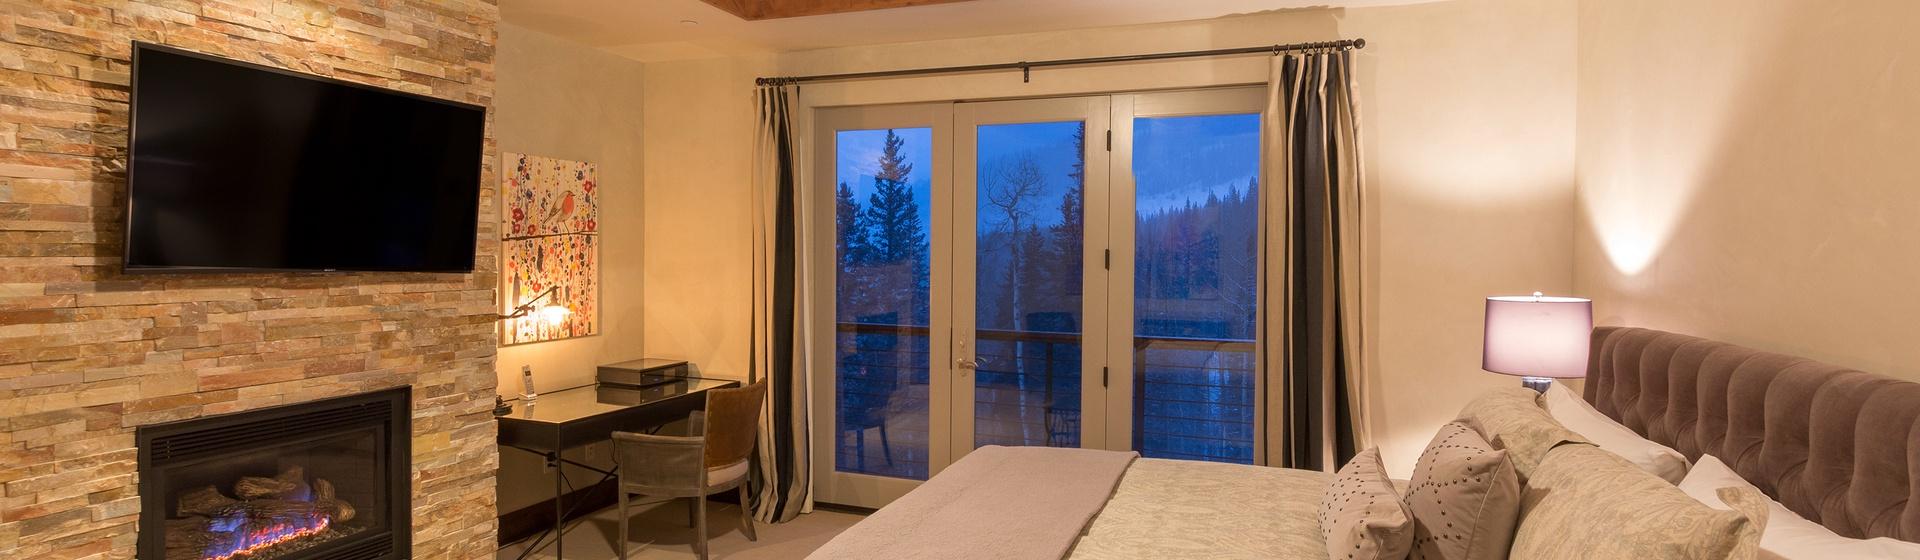 11-Telluride-Cassidy-Ridge-A103-Master-Bedroom-1-Web.jpg